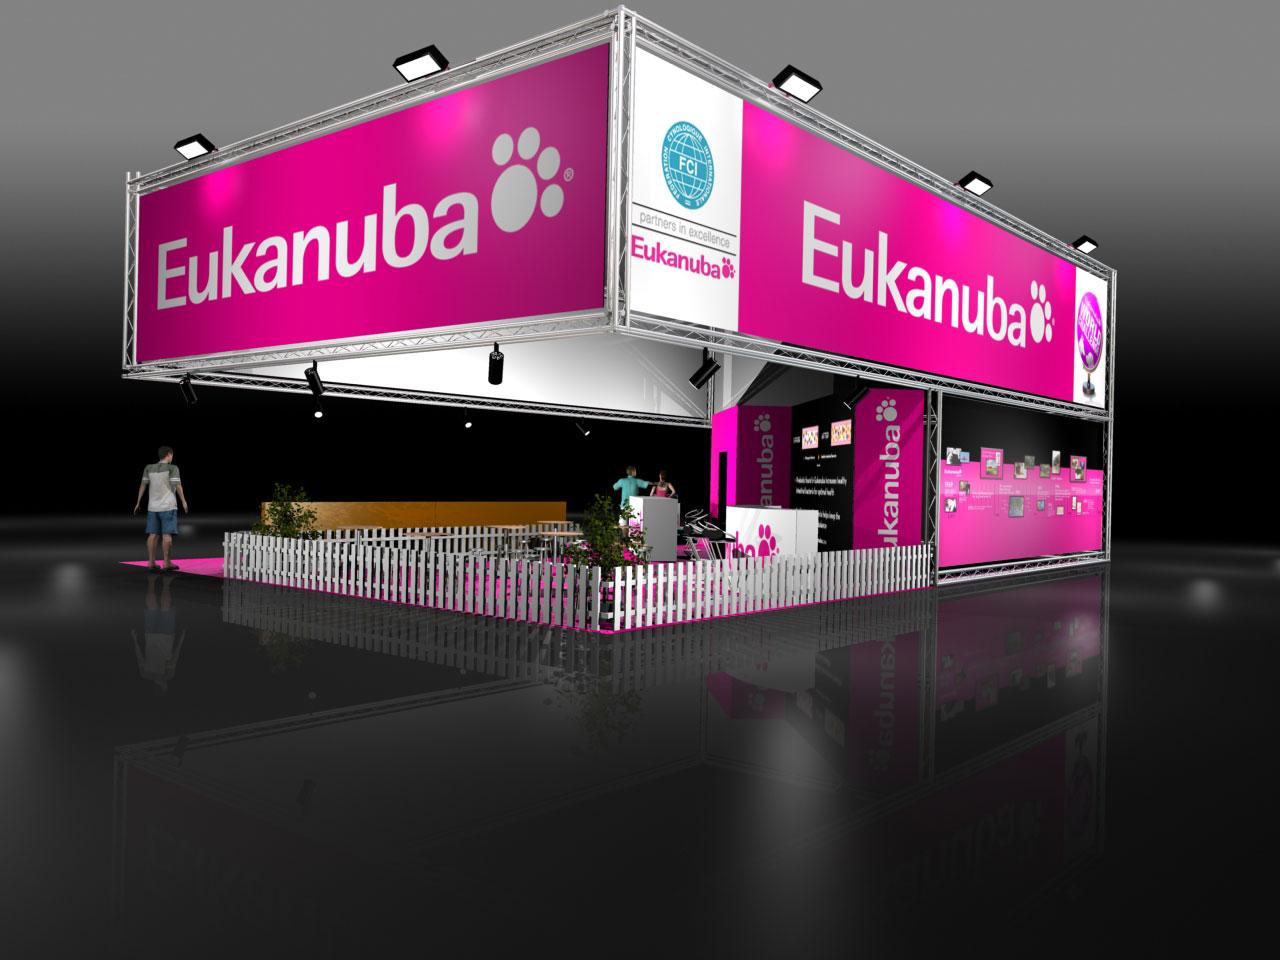 Exhibition Stand Visuals : Exhibition stand visuals iams eukanuba wordsearch ltd